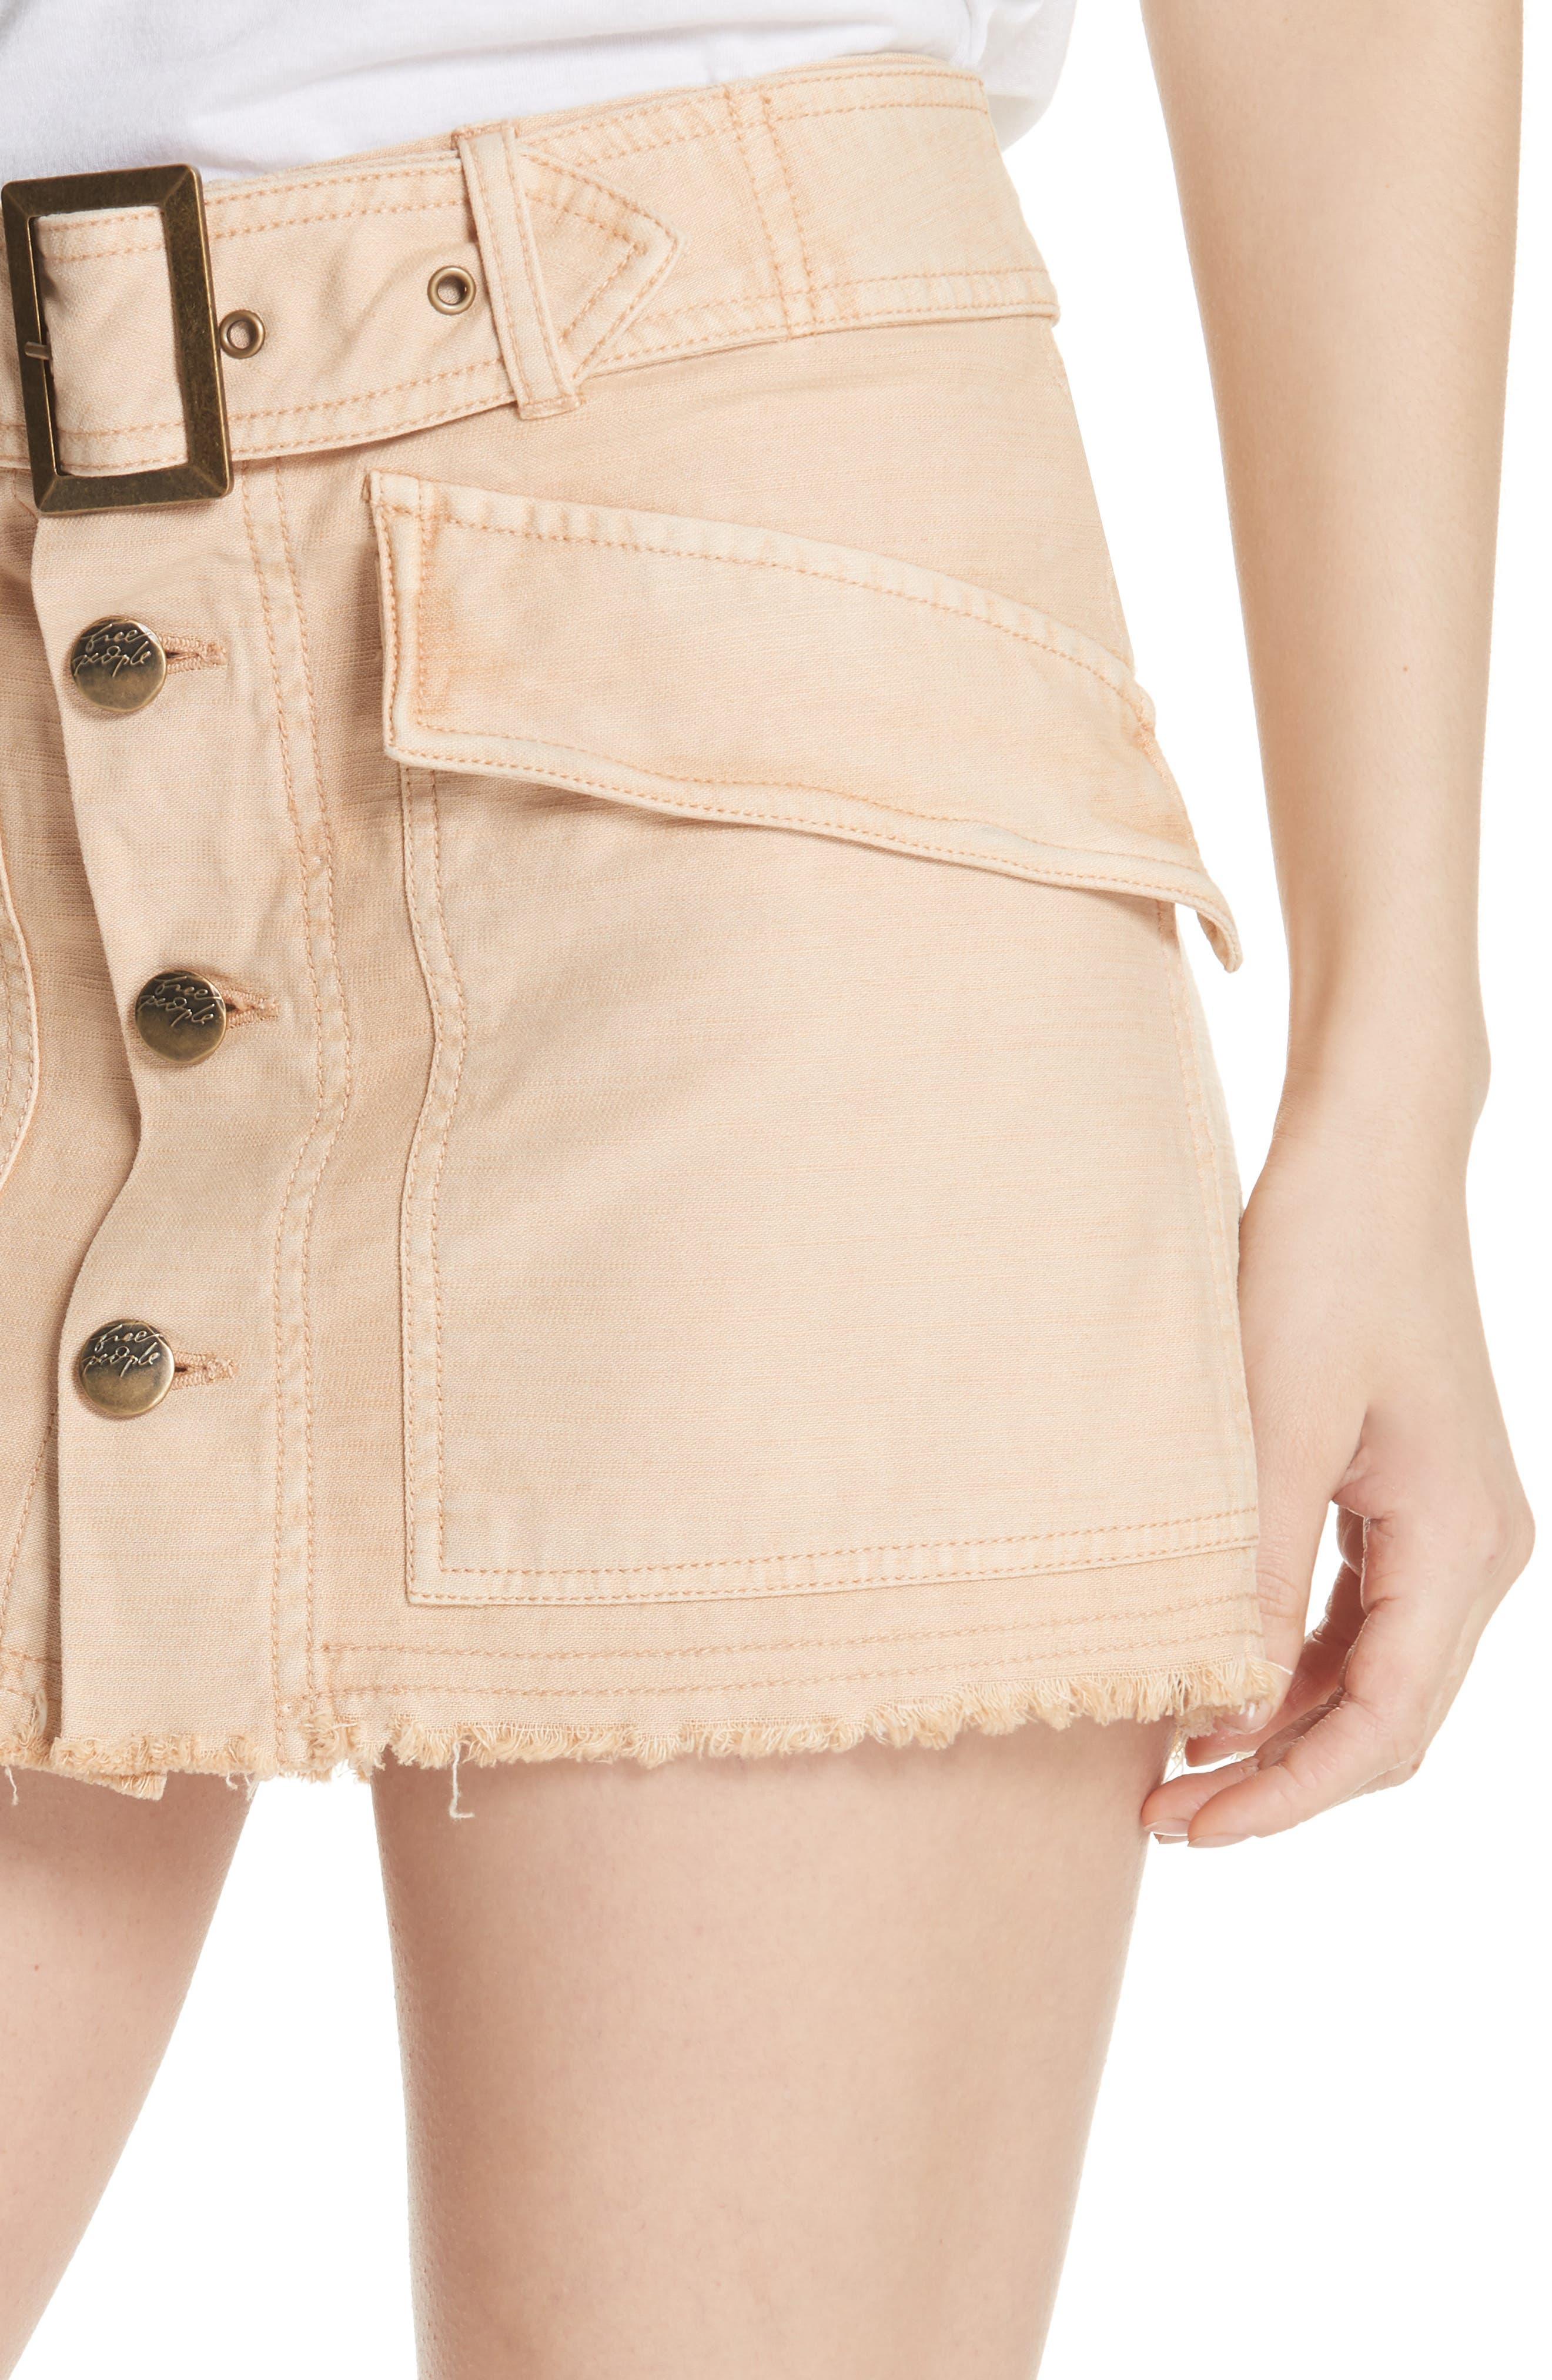 Hangin' On Tight Miniskirt,                             Alternate thumbnail 7, color,